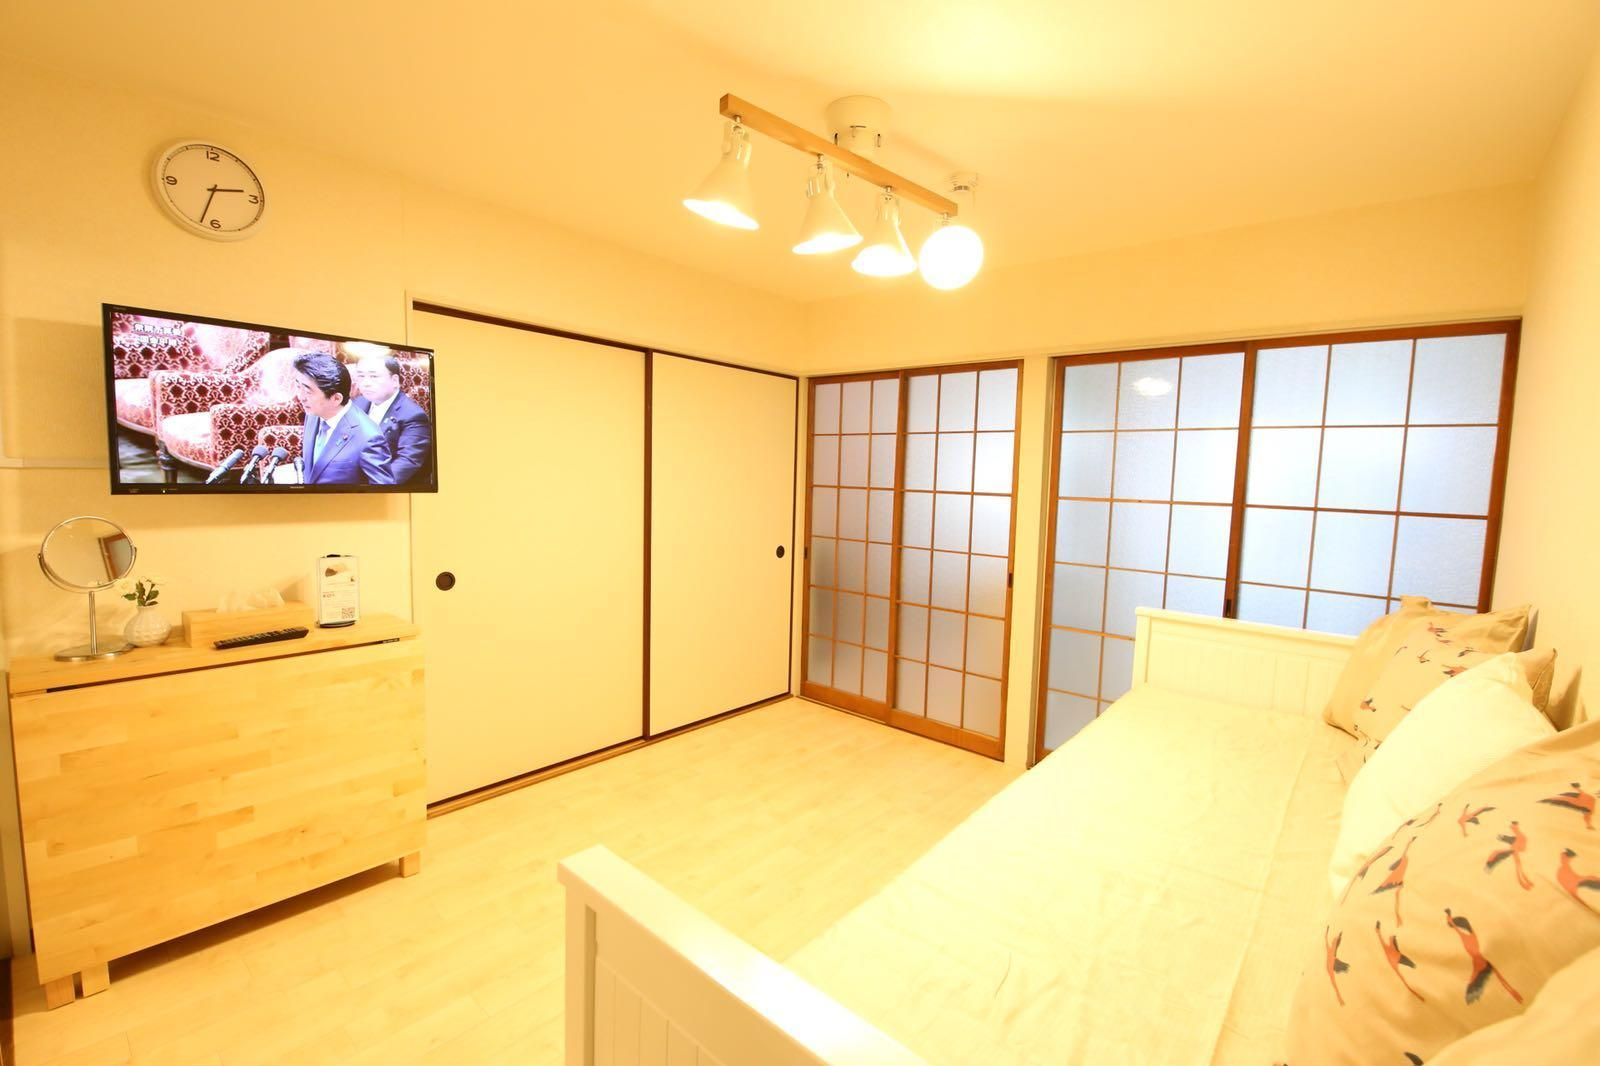 2 8ppl*4 D Bed Hse Near JR*Dobutsuenmae*2 P Wifi